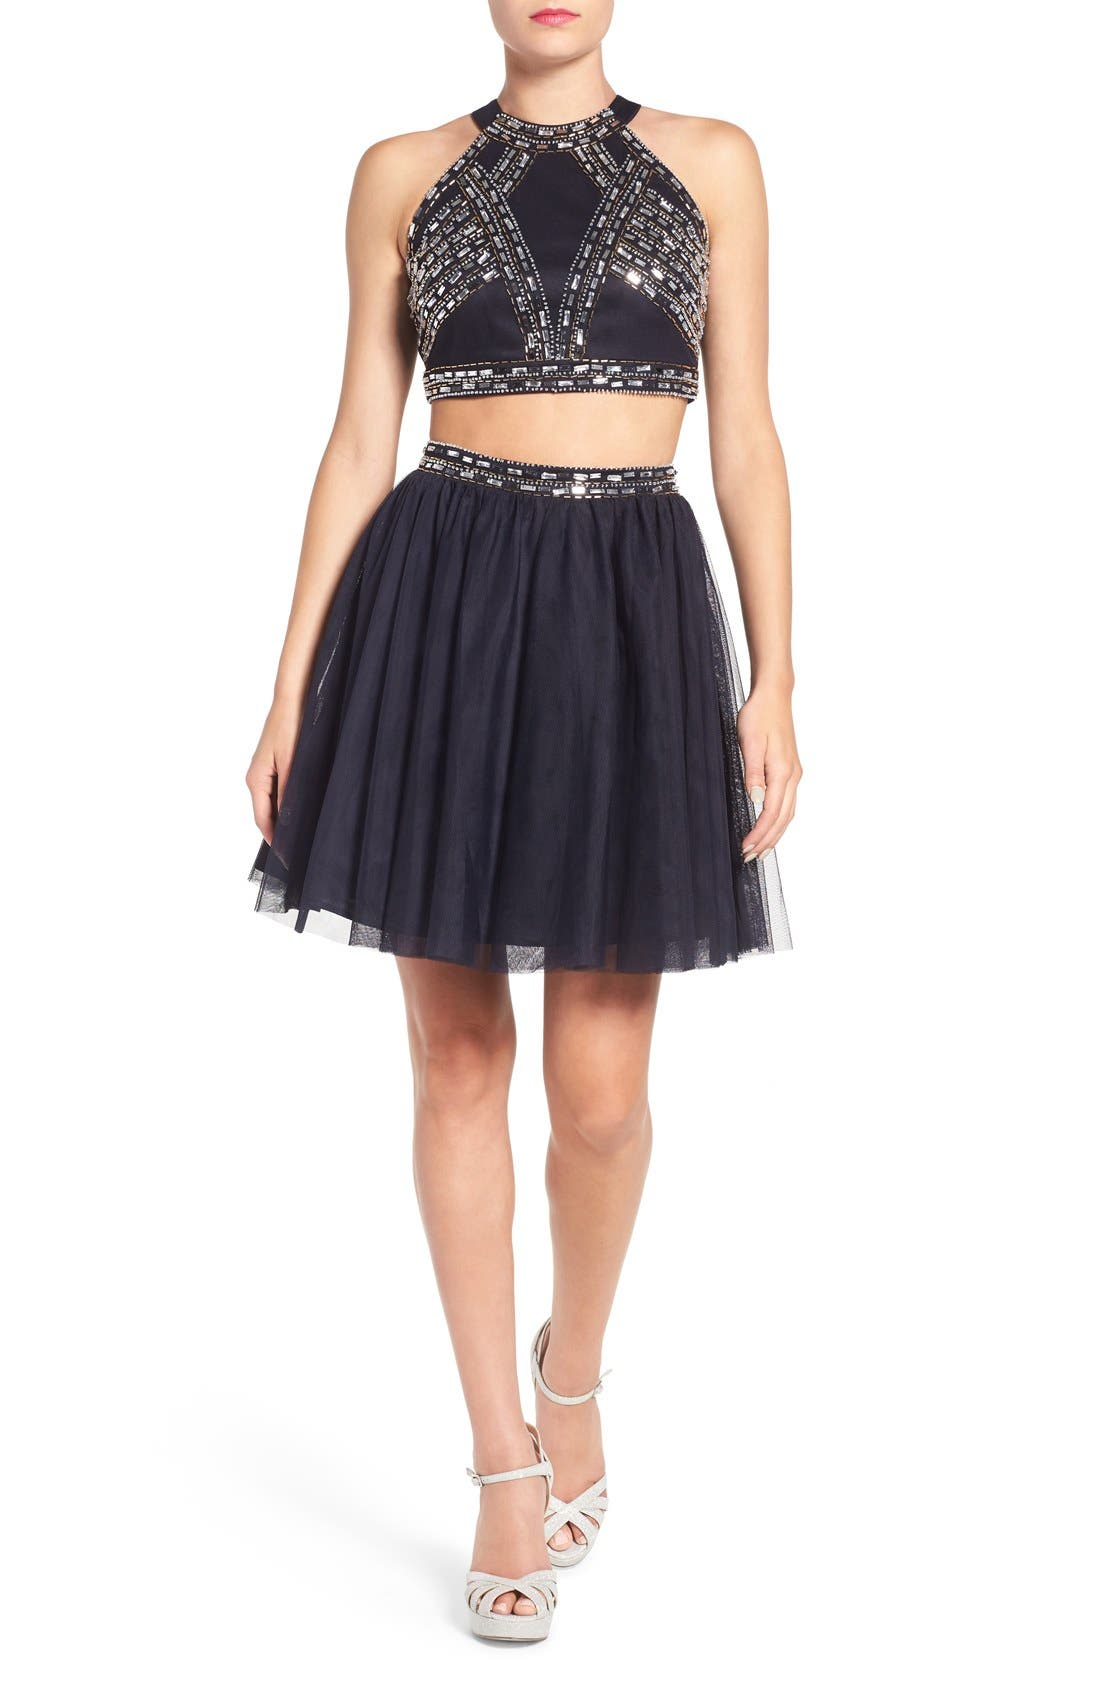 Main Image - Blondie Nites Embellished Two-Piece Skater Dress